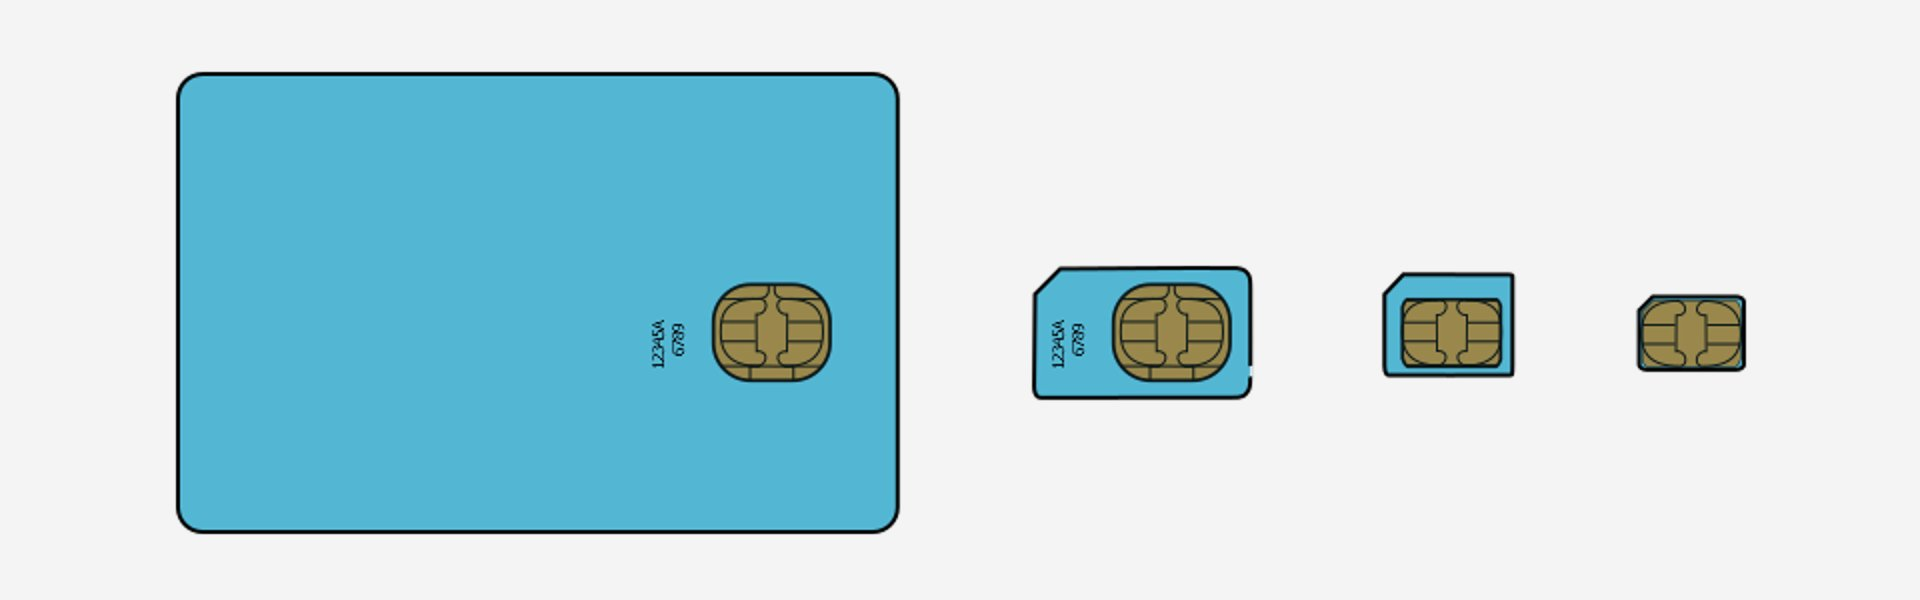 (from Left To Right) Fullsize Sim, Mini Sim, Micro Sim